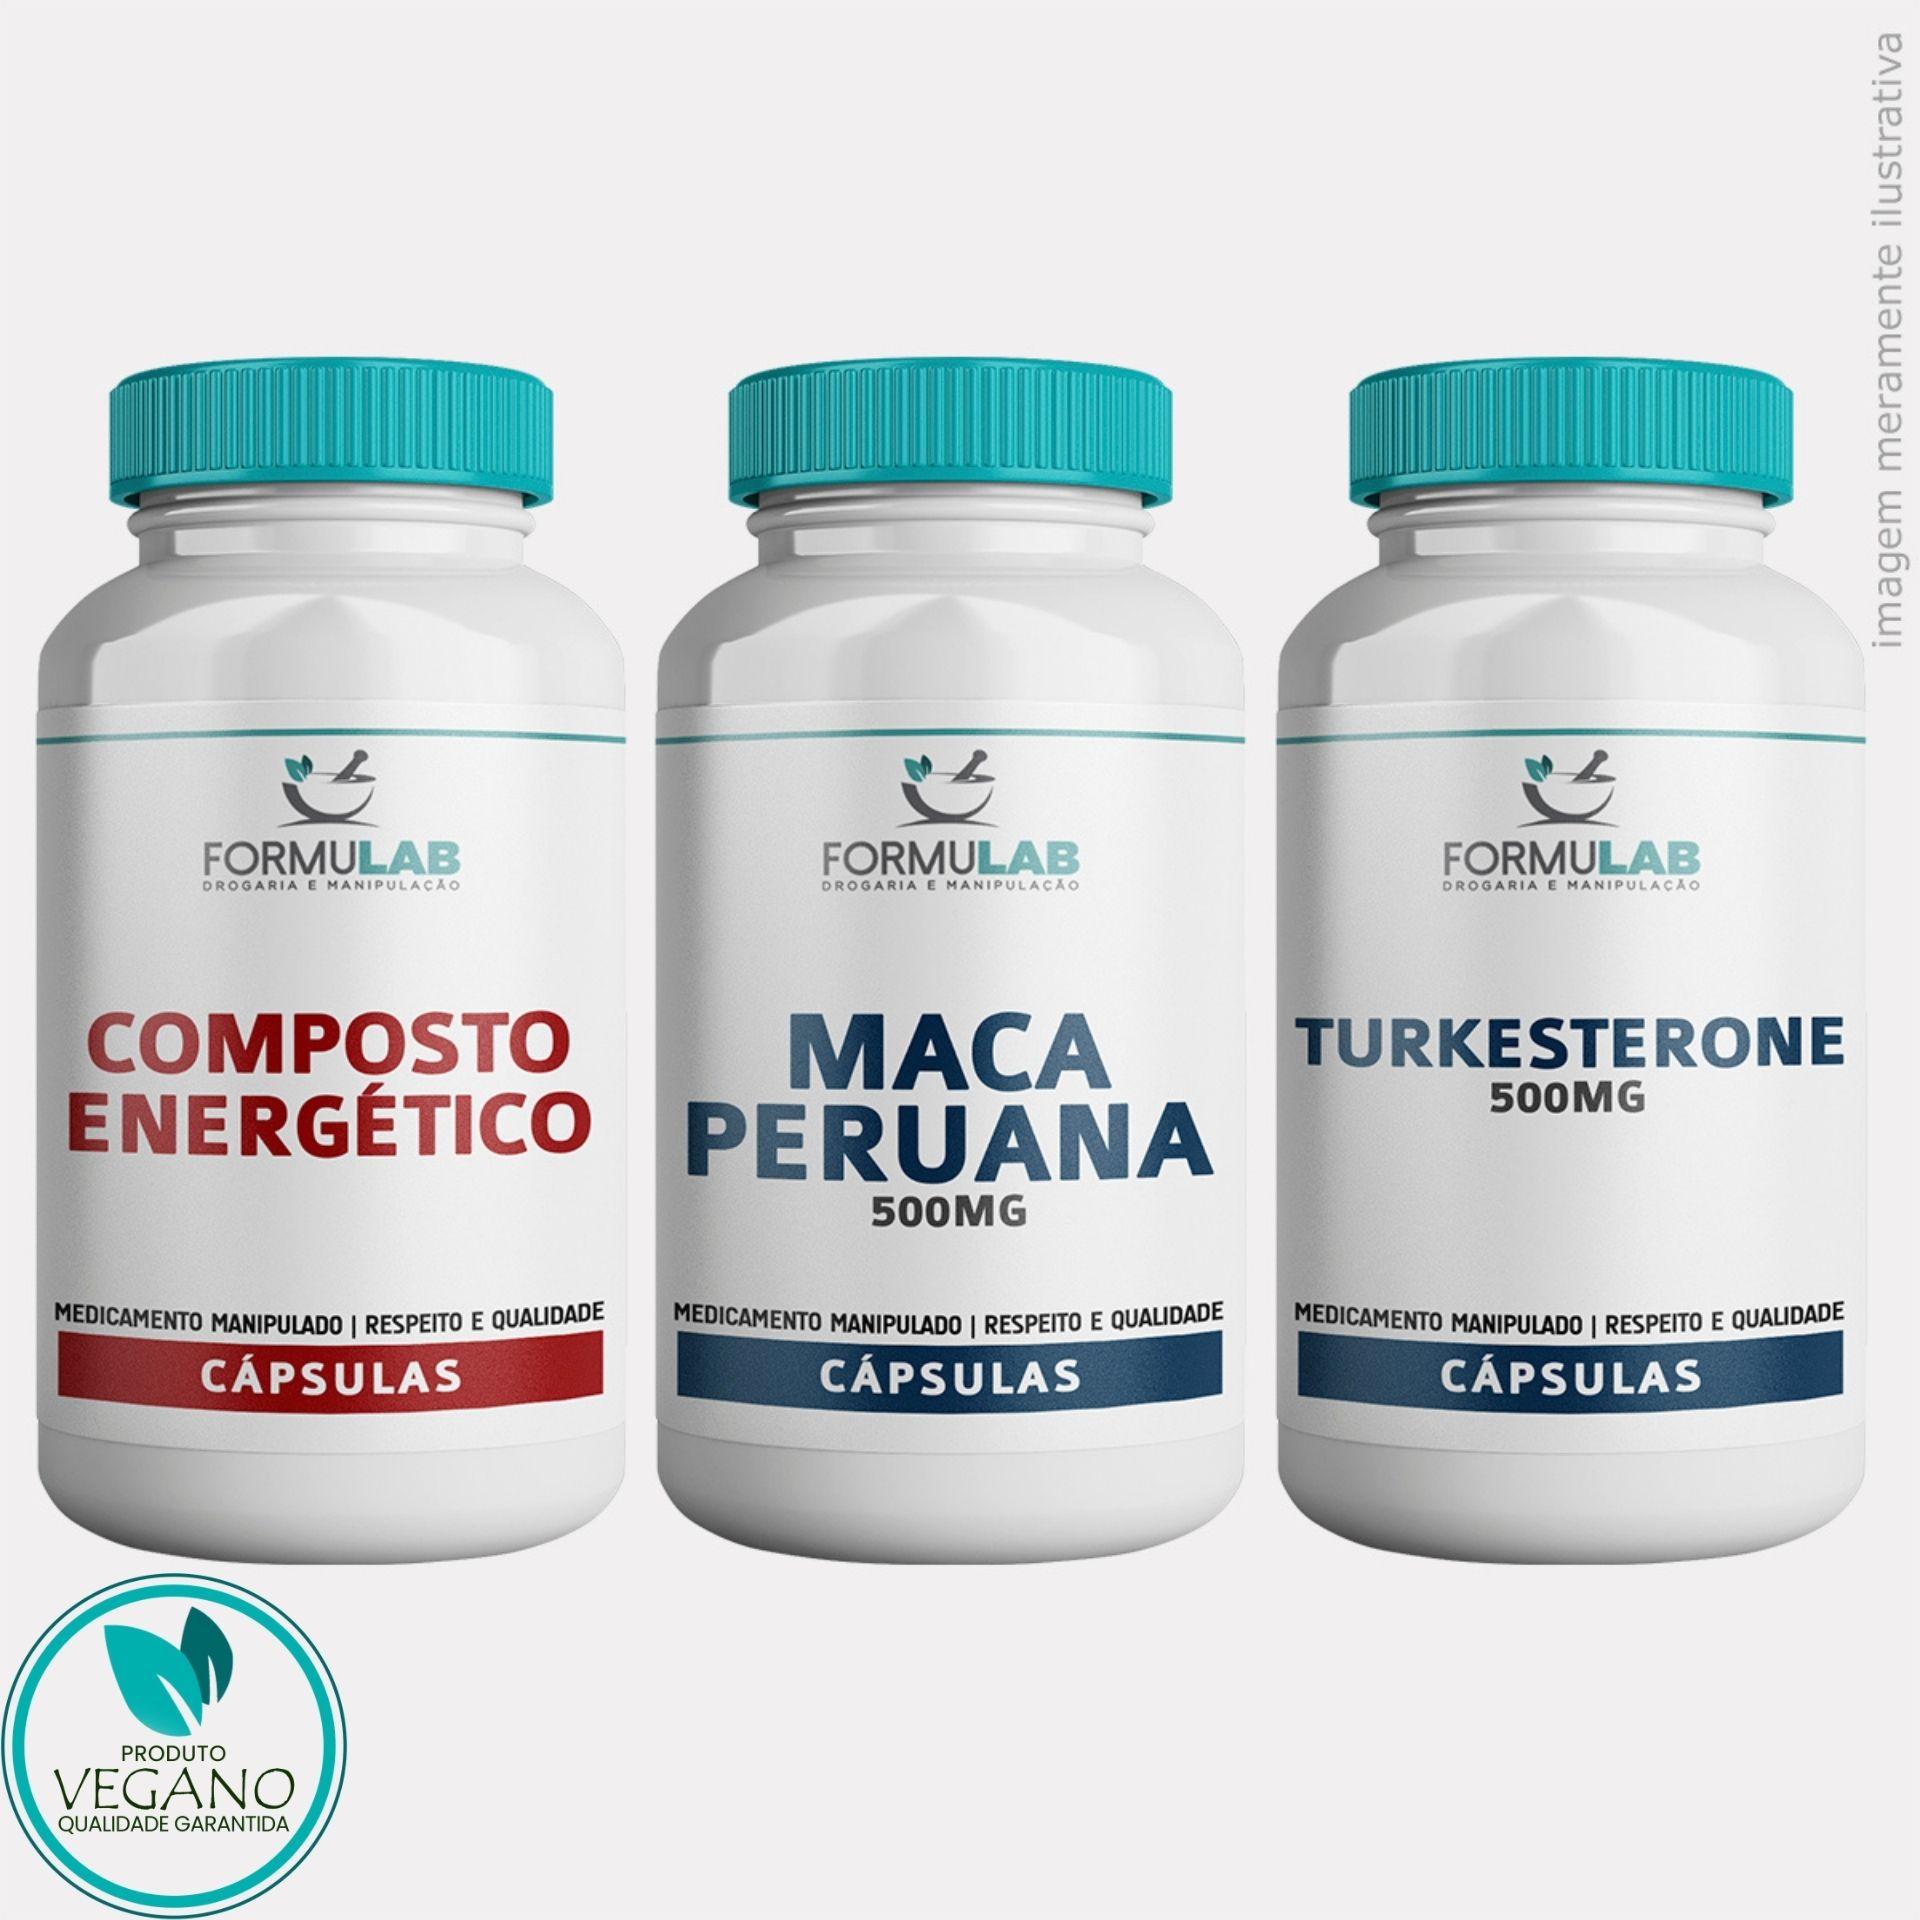 Kit DESEMPENHO FÍSICO VEGAN - Composto Enérgico +  Maca Peruana 500mg + Turkesterone 500mg